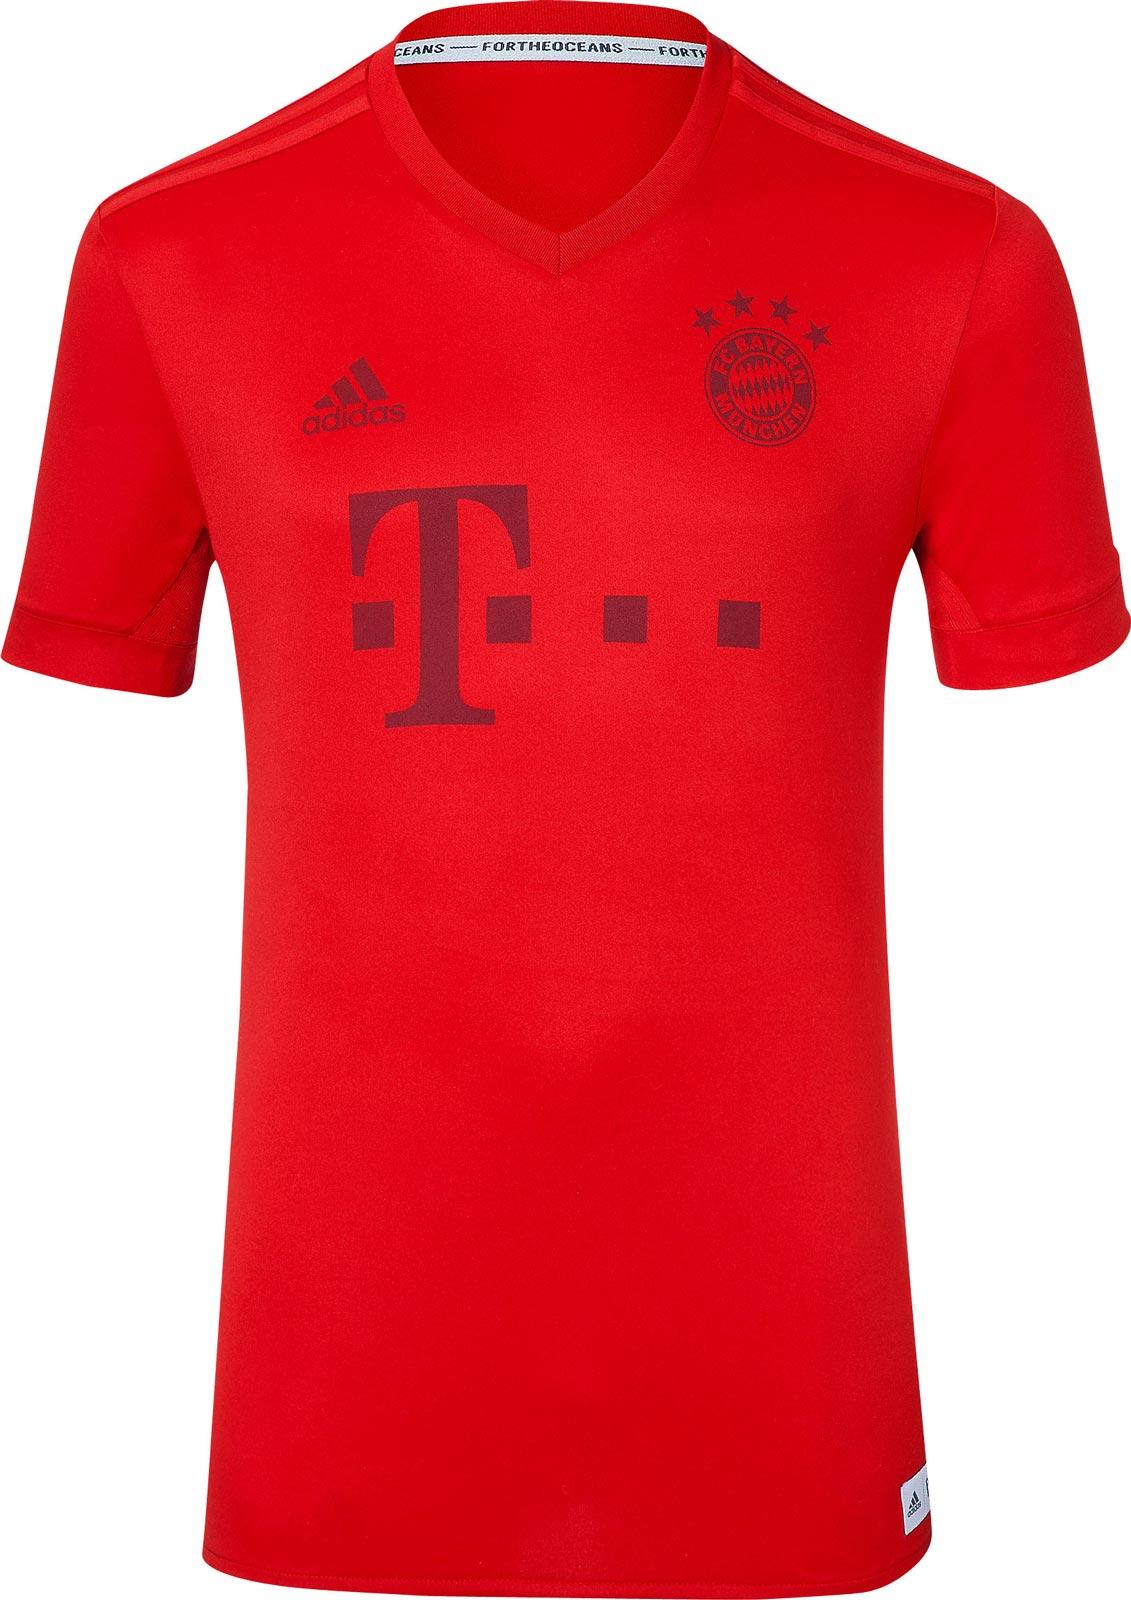 Adidas Parley Bayern Munich Kit Released - Footy Headlines